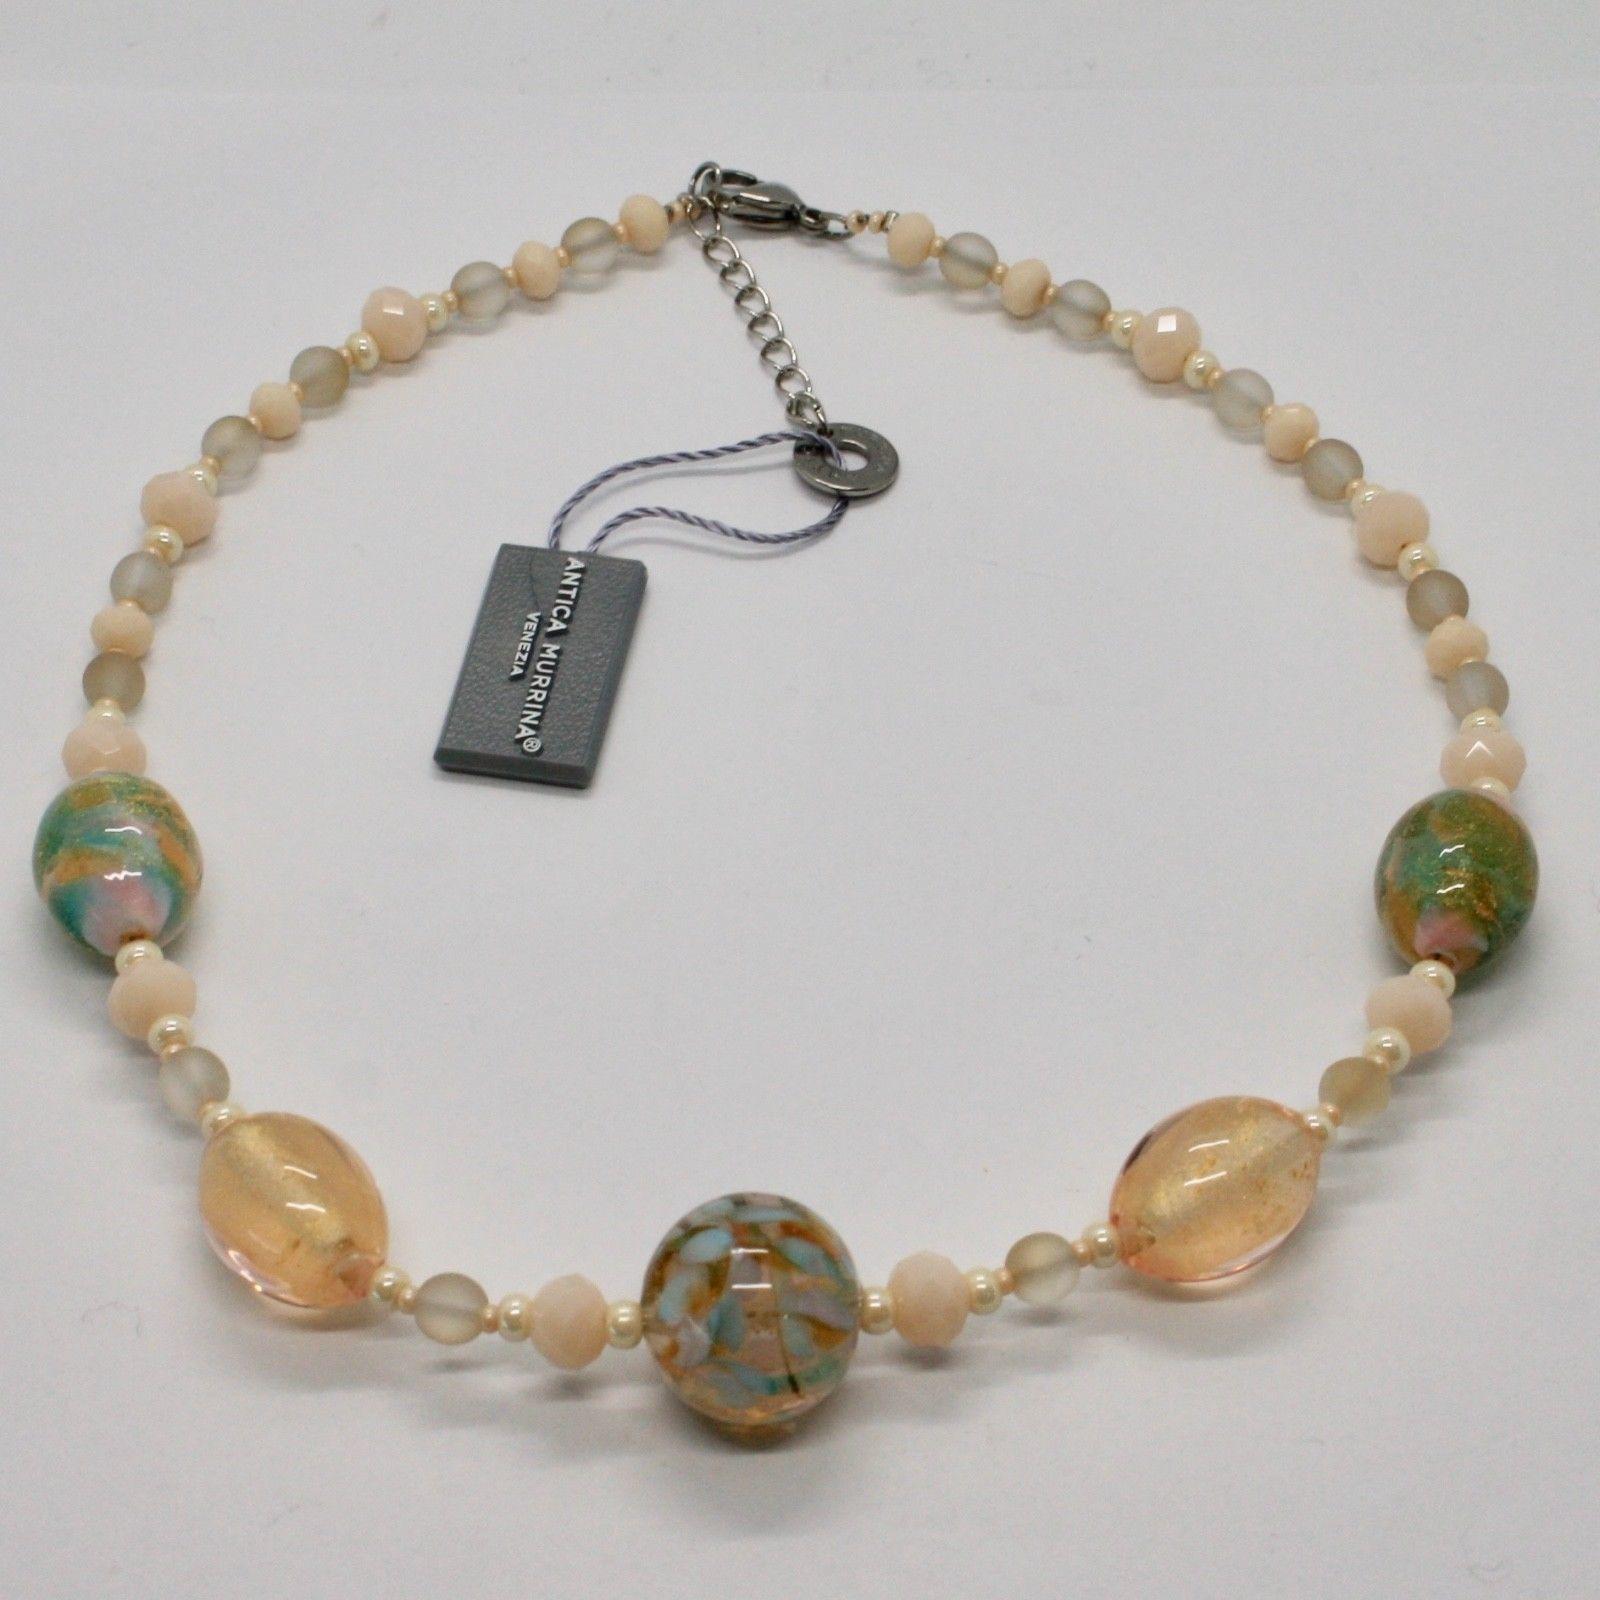 ANTICA MURRINA VENEZIA NECKLACE WITH MURANO GLASS YELLOW GOLD BEIGE COA78A03